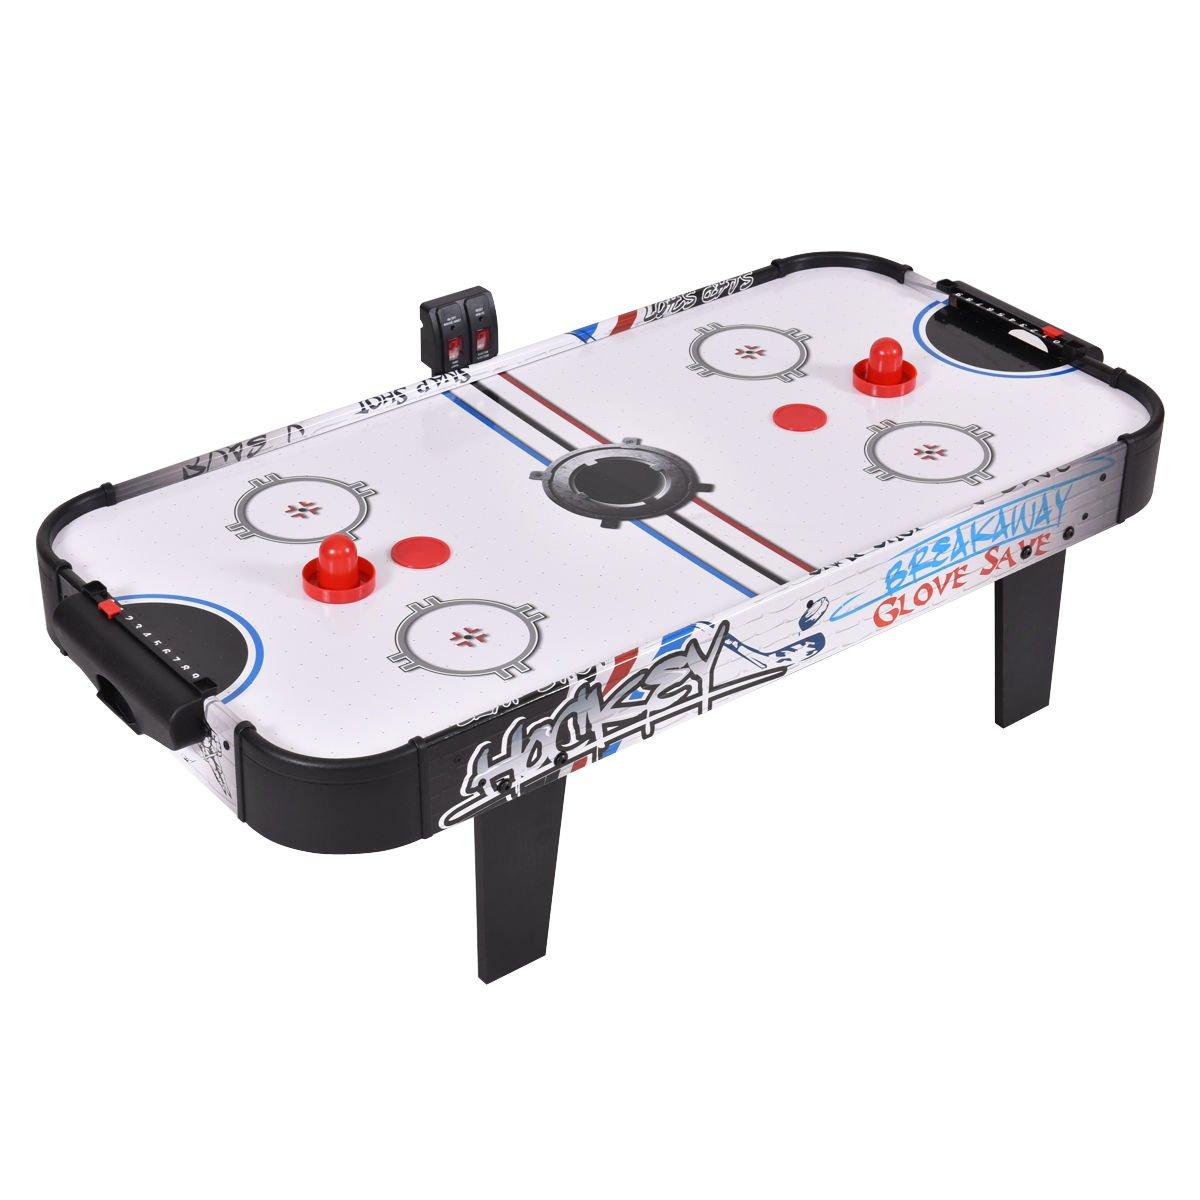 Goplus 42'' Air Powered Hockey Table Game Room Indoor Sport Electronic Scoring 2 Pushers